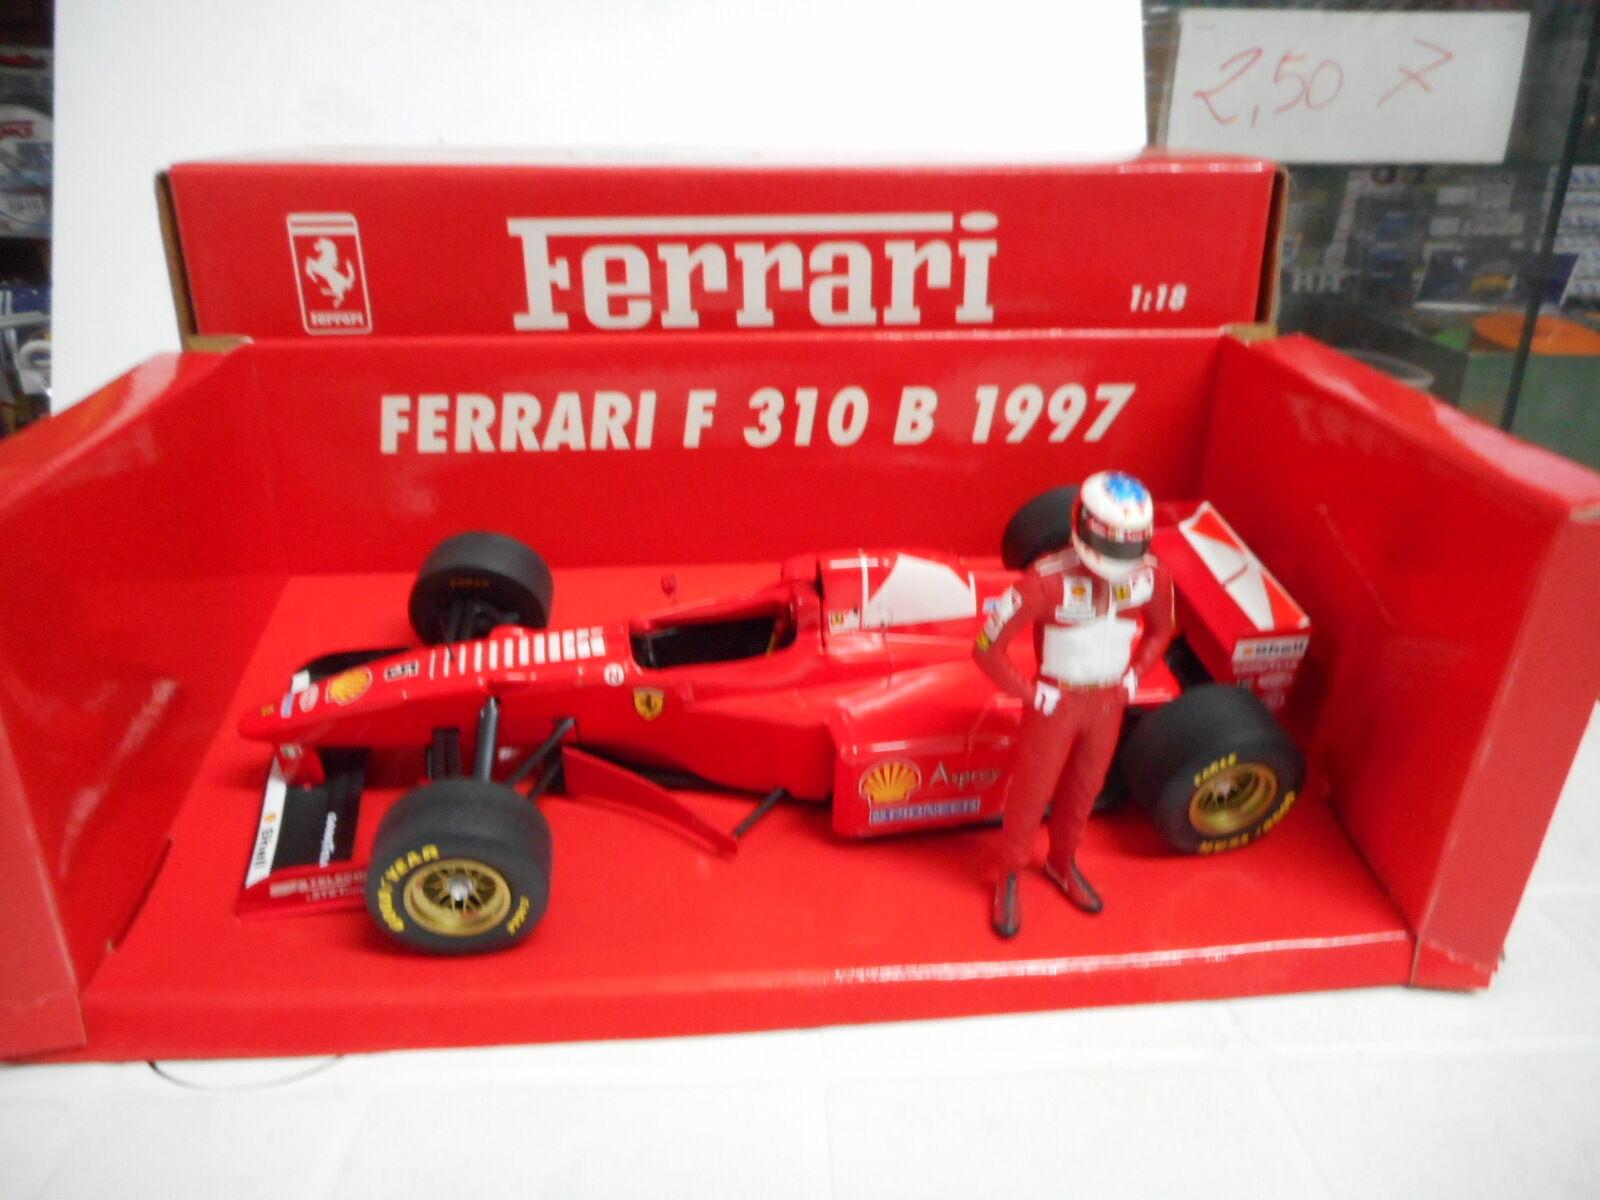 MINICHAMPS 1 18 - F1 FERRARI F310 B 1997 CON FIGURA DI M.SCHUMACHER